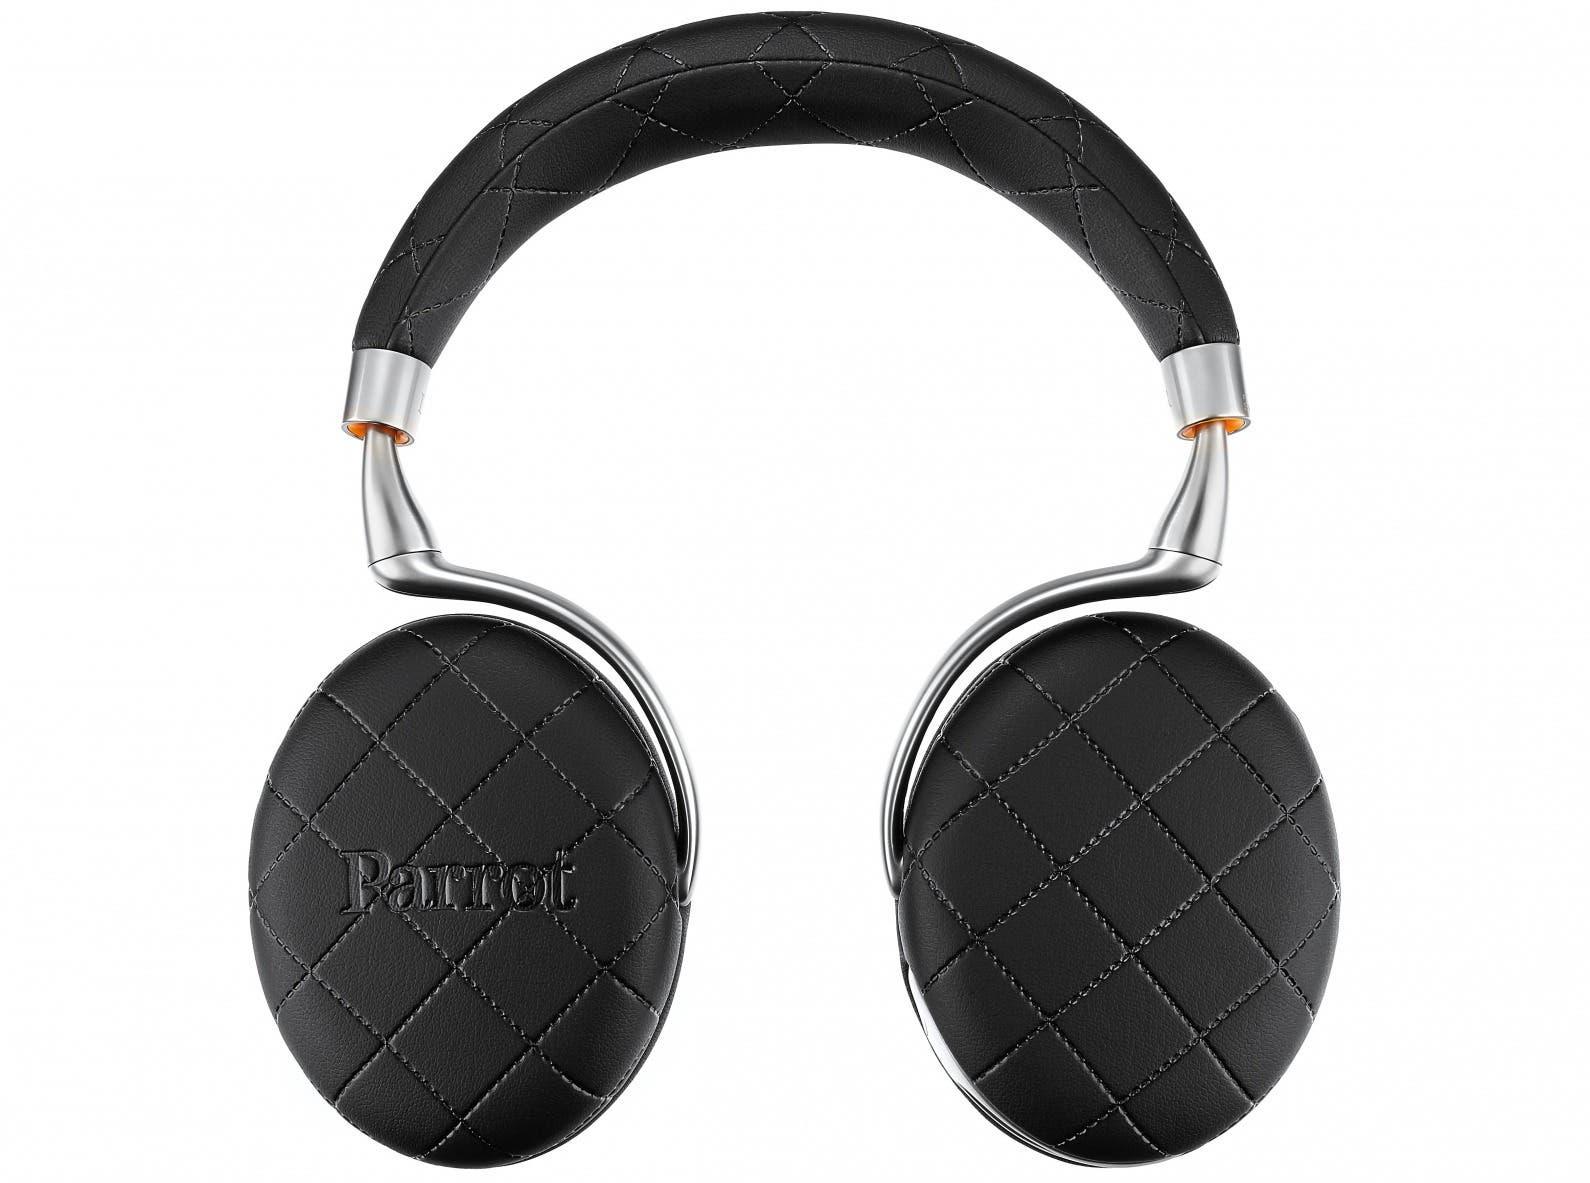 wireless headphones review best bluetooth headphones of 2016. Black Bedroom Furniture Sets. Home Design Ideas